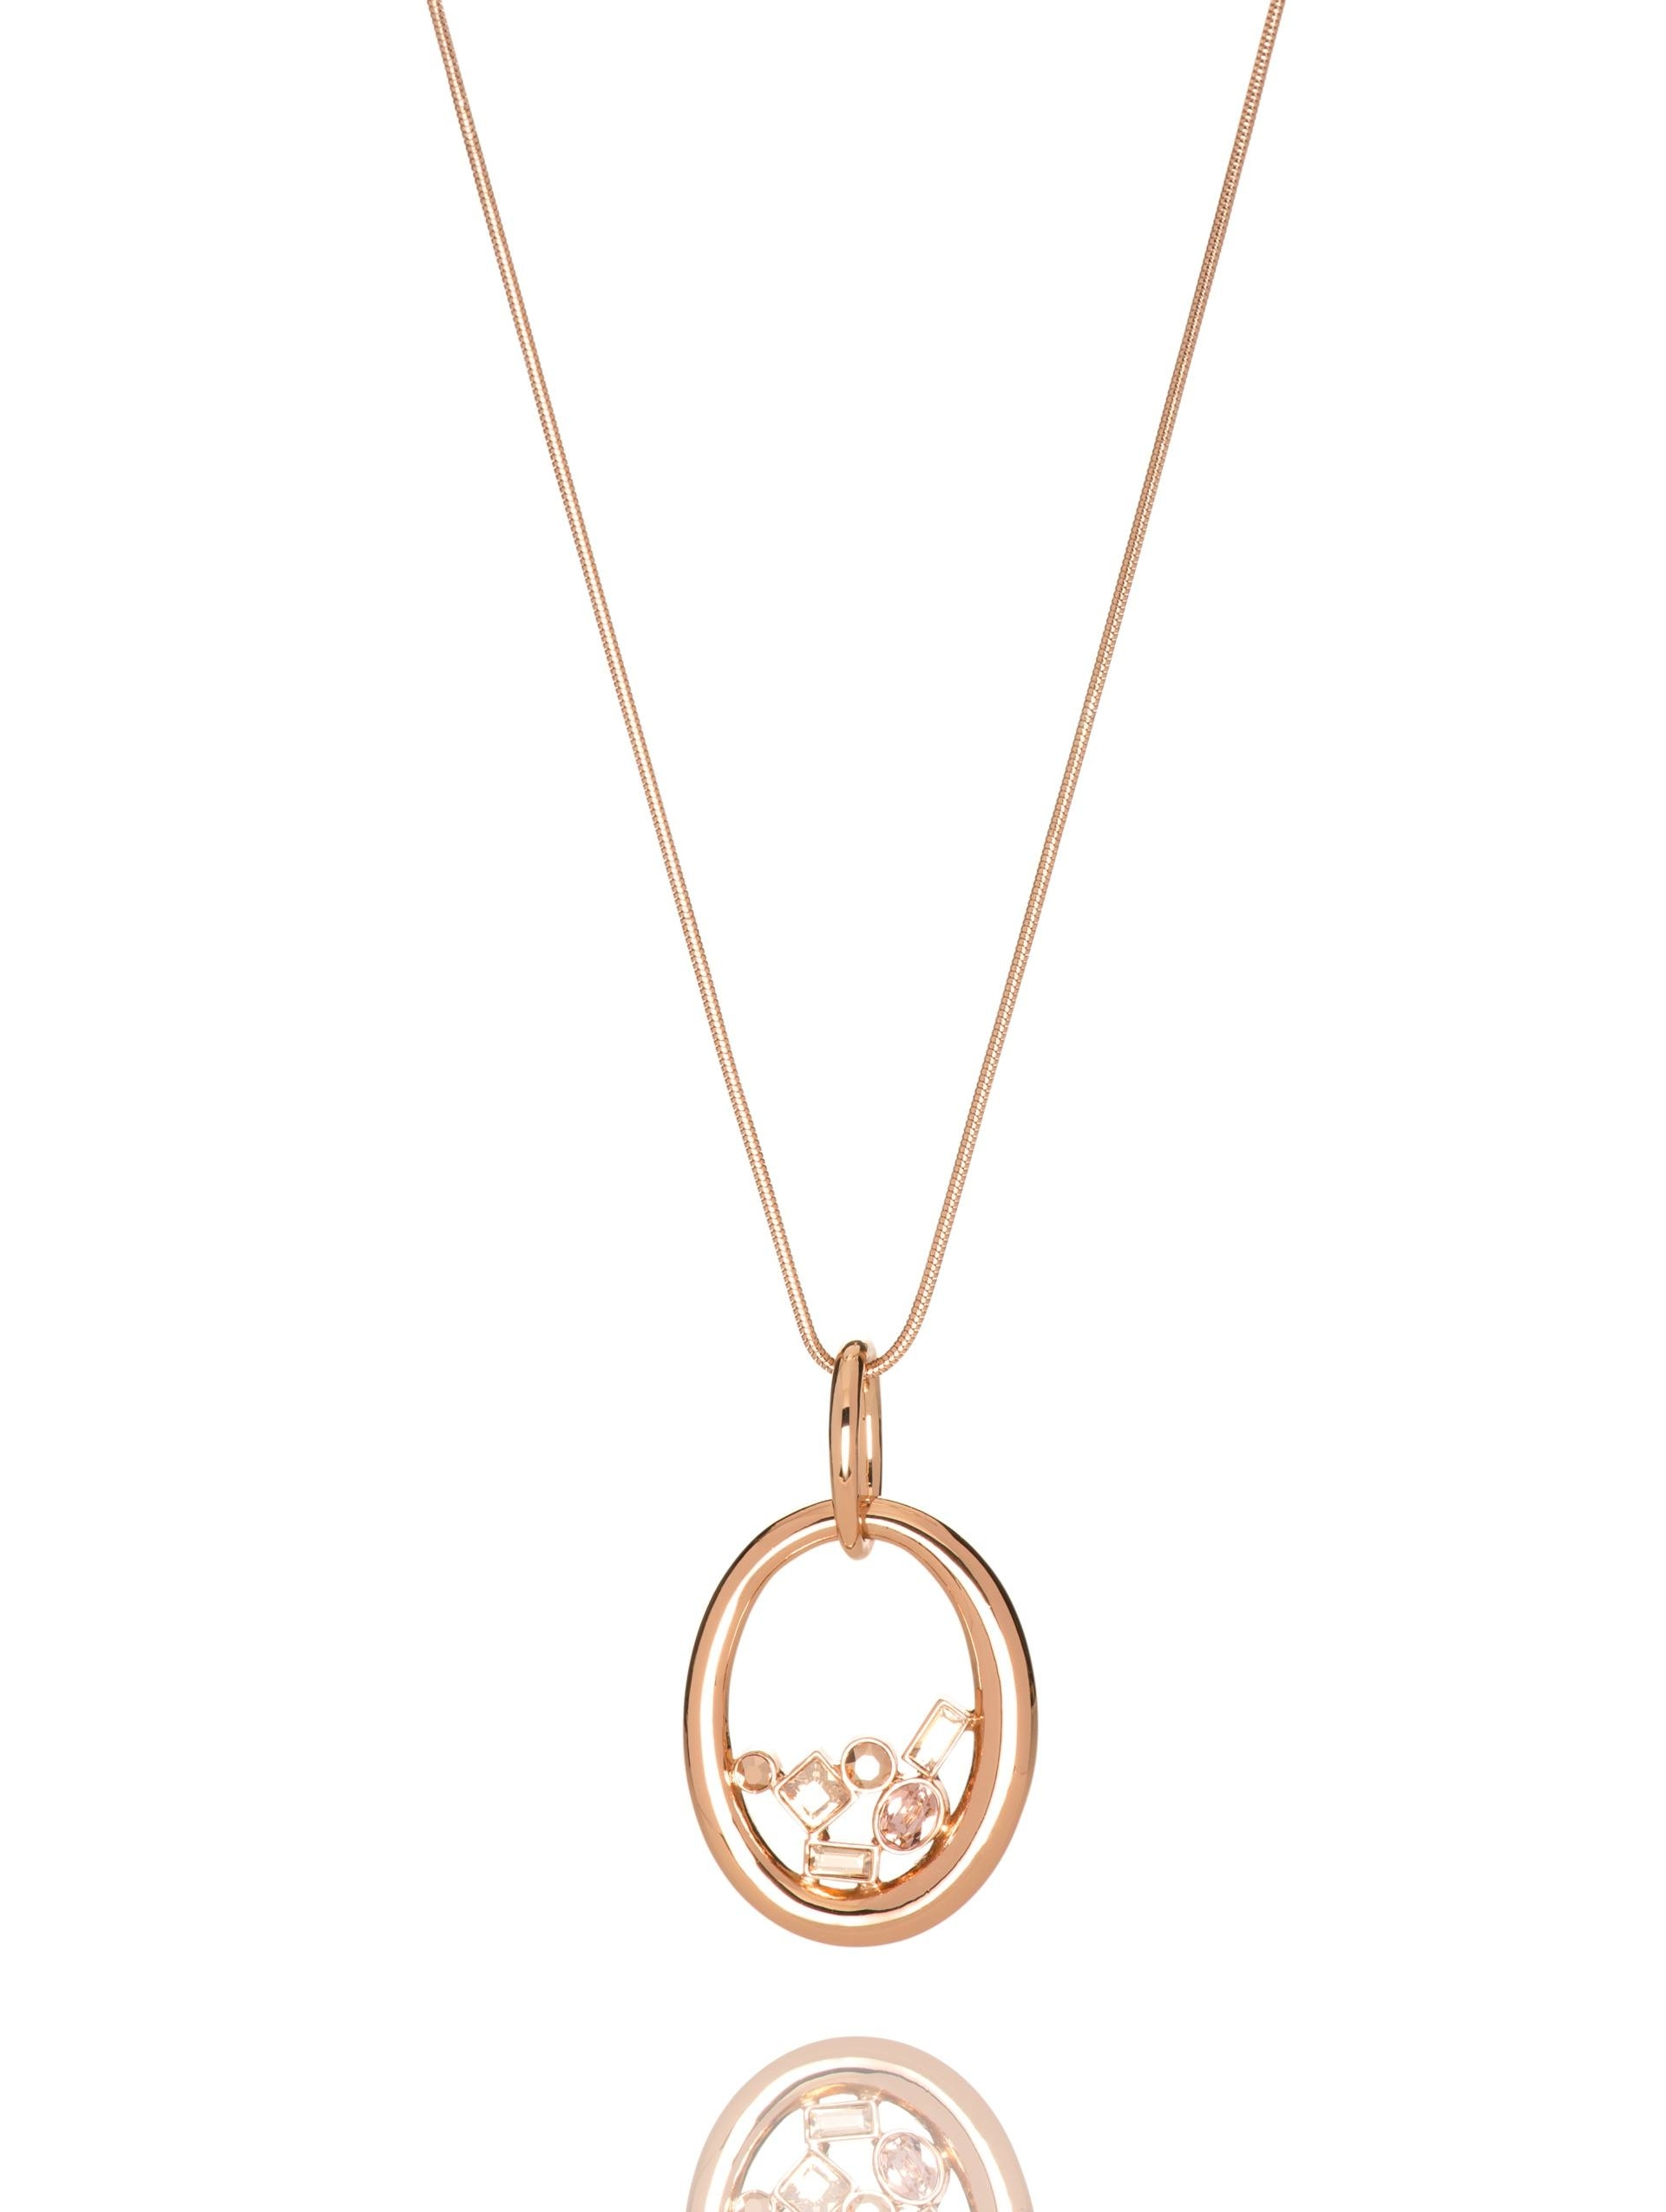 Shop Designer Necklaces for Women | St. John Knits